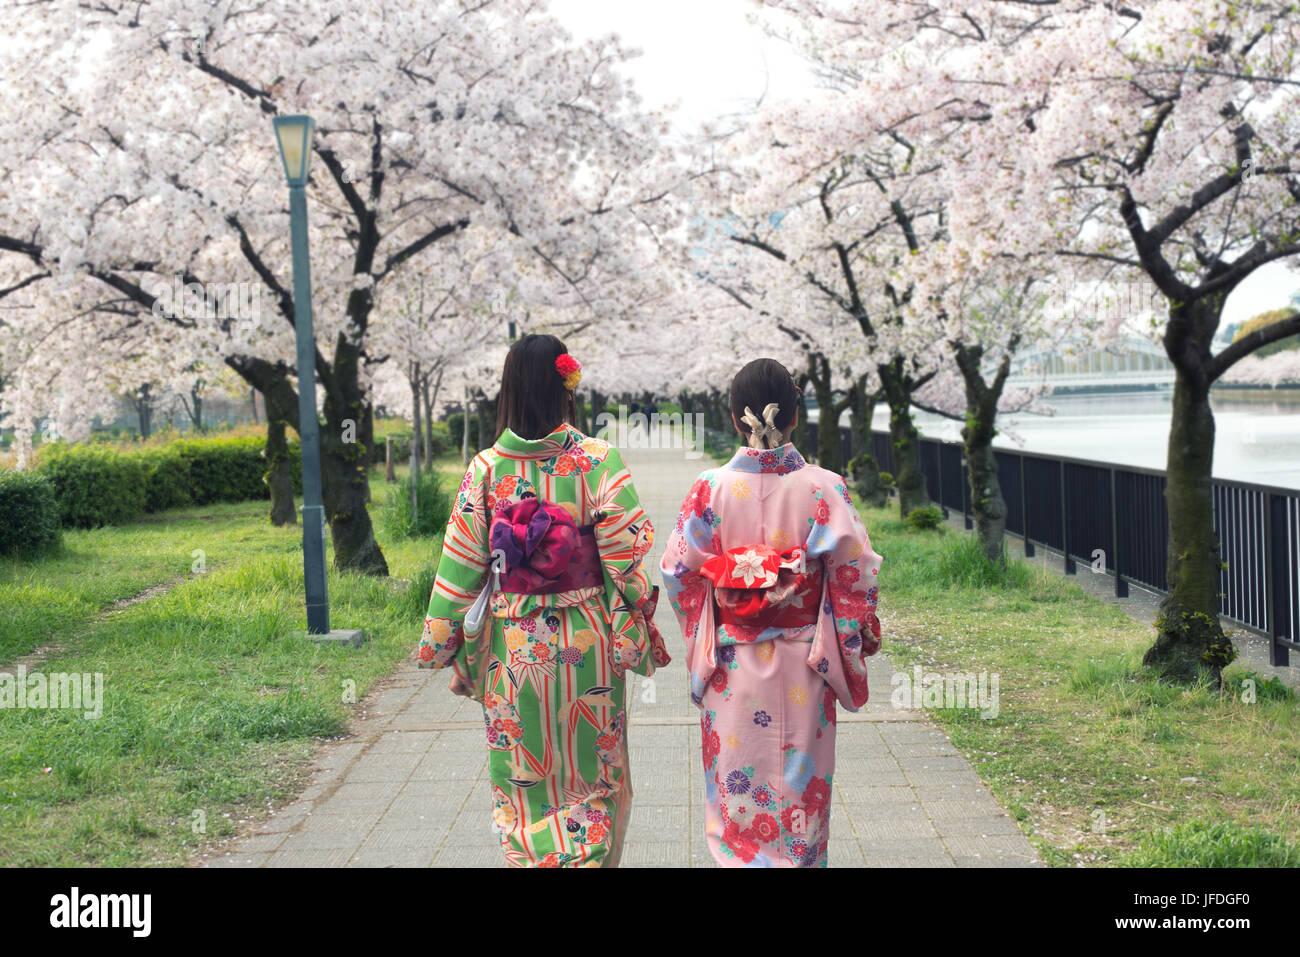 Par de mujeres asiáticas vistiendo kimono tradicional japonés en Sakura Garden en Osaka, Japón. Imagen De Stock